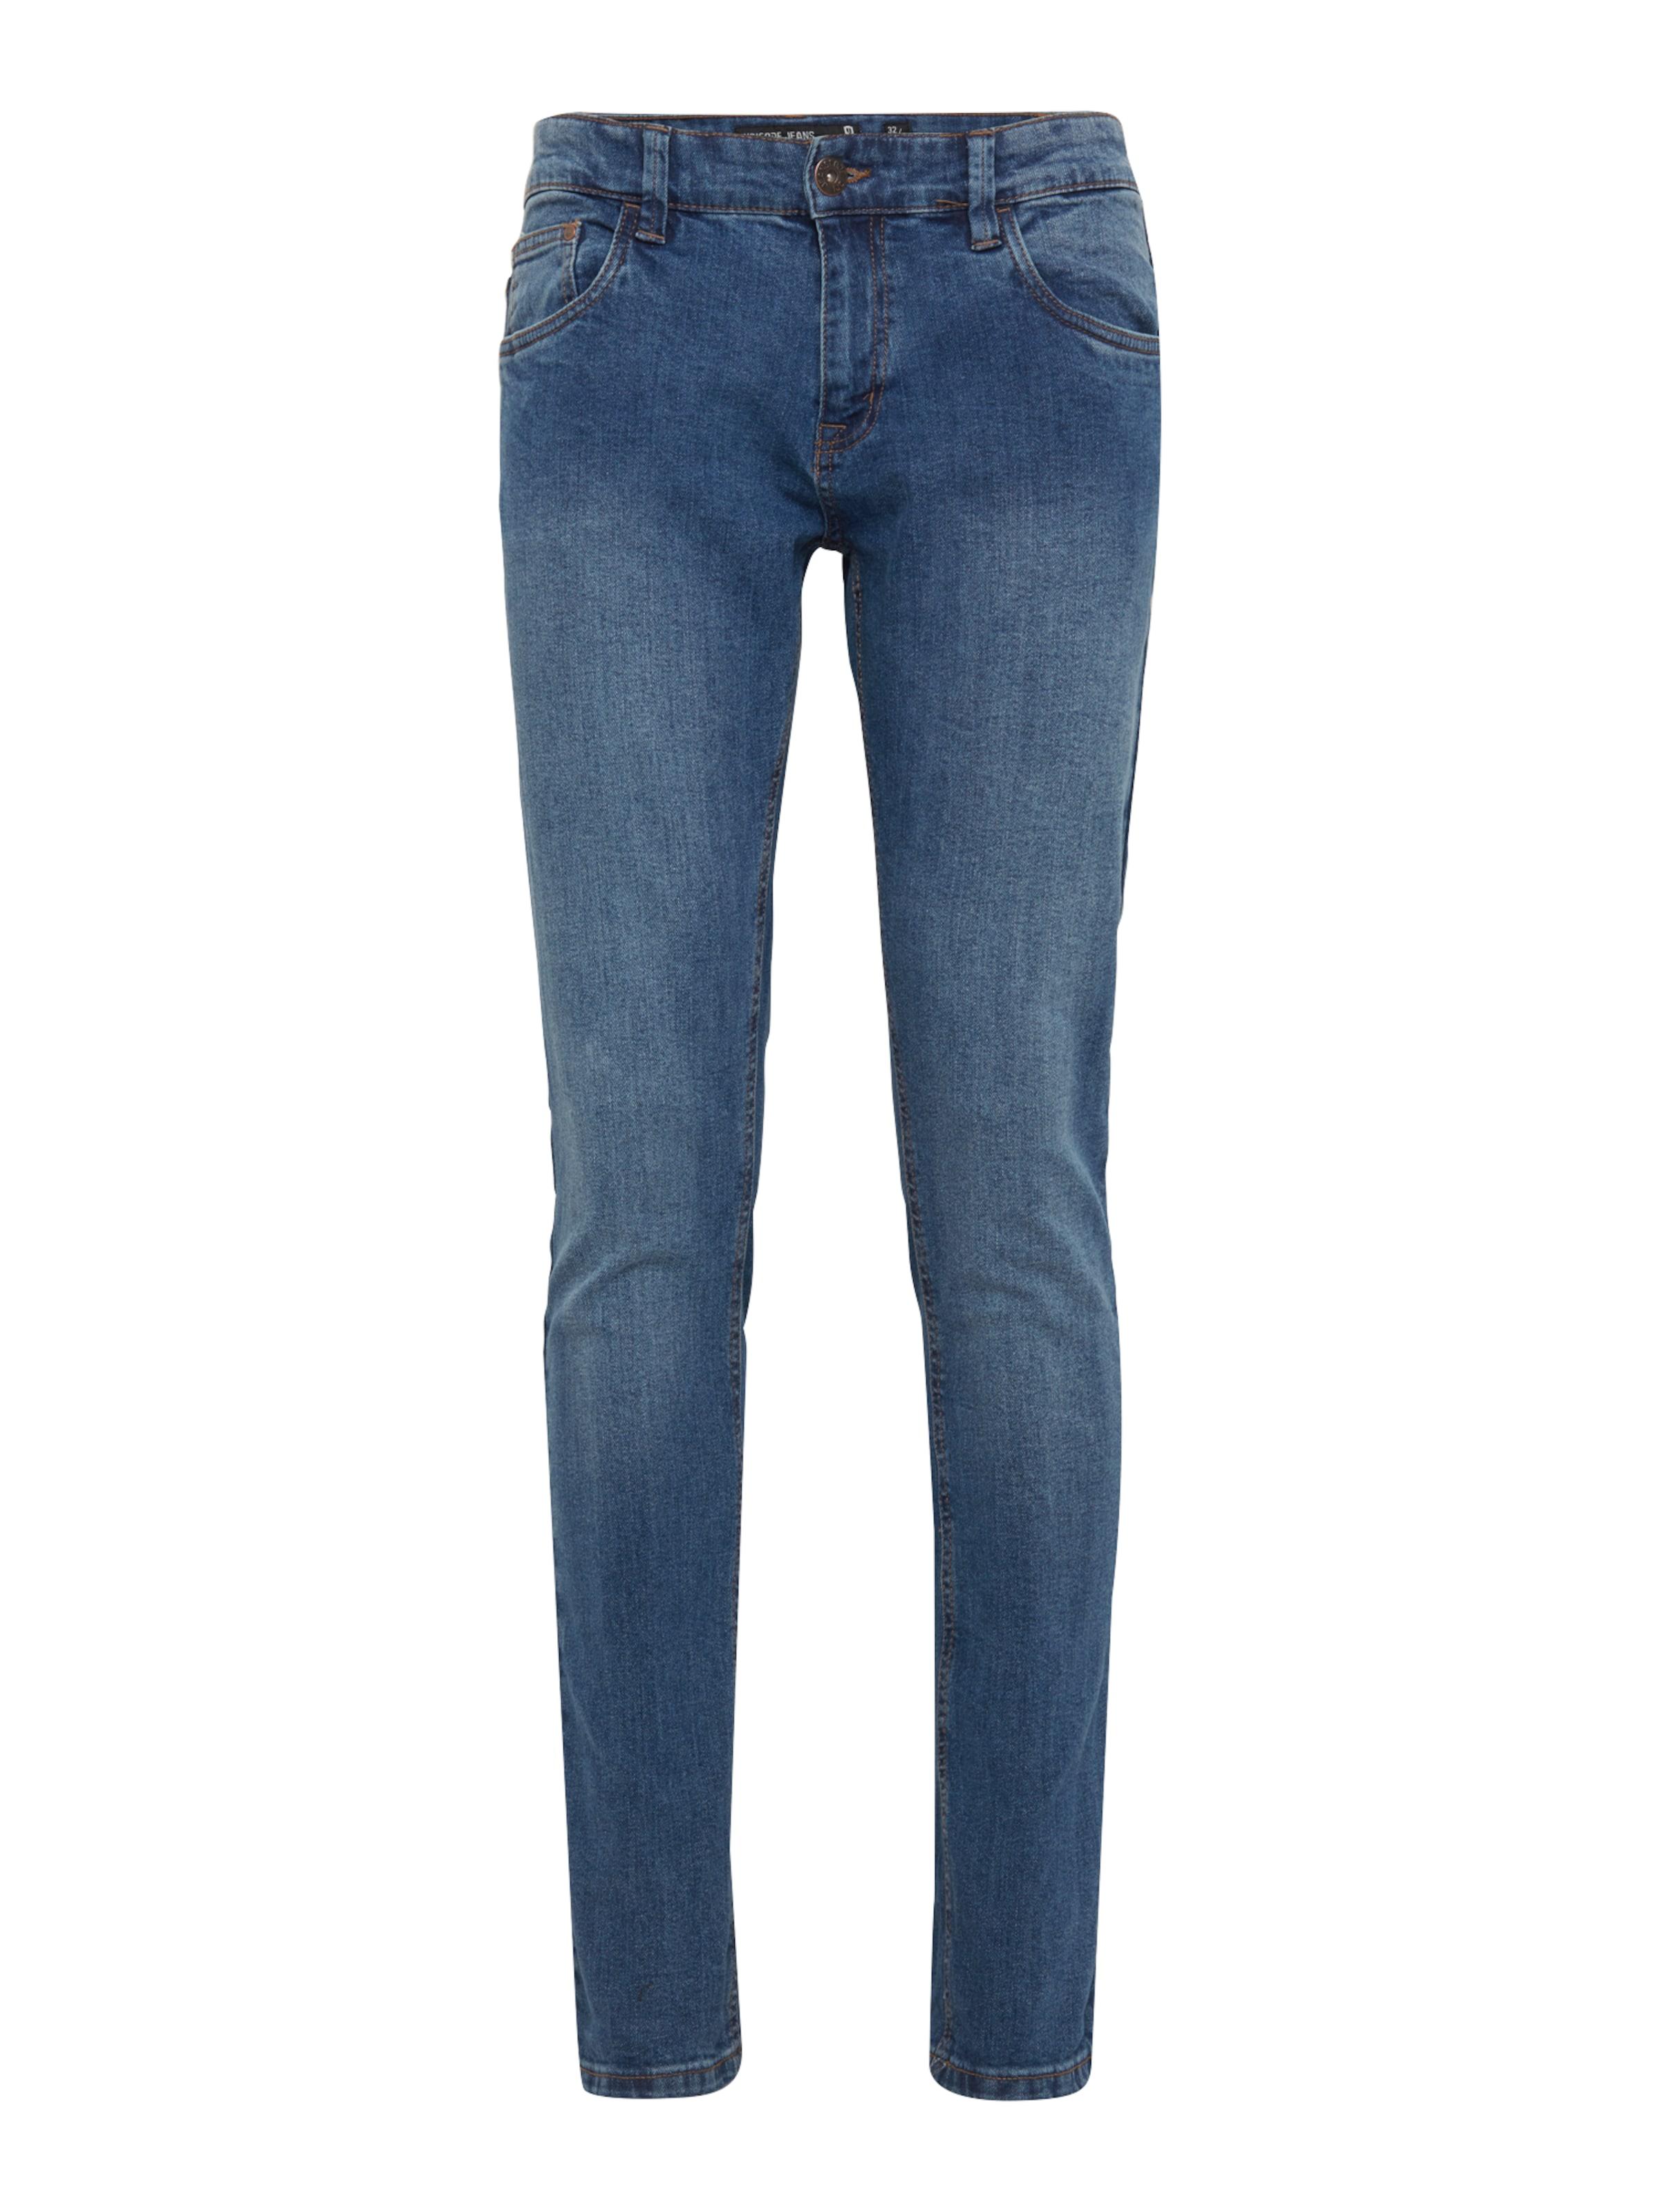 Bleu Indicode Denim JeansJean 'pitsburg' In OwkNn0X8PZ